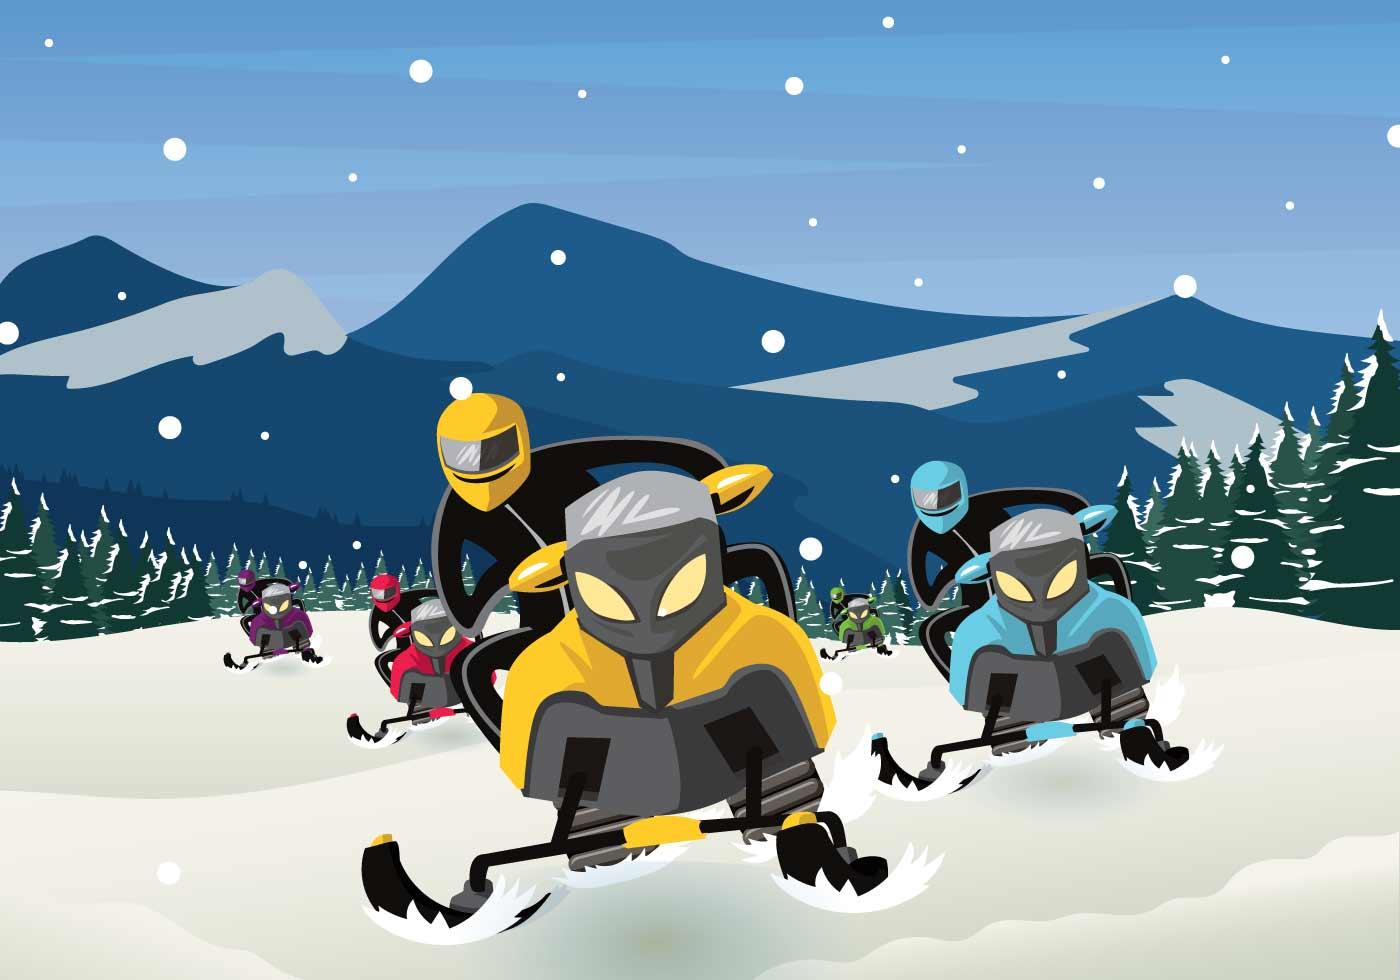 Free Snowmobile Illustration - Download Free Vector Art ...